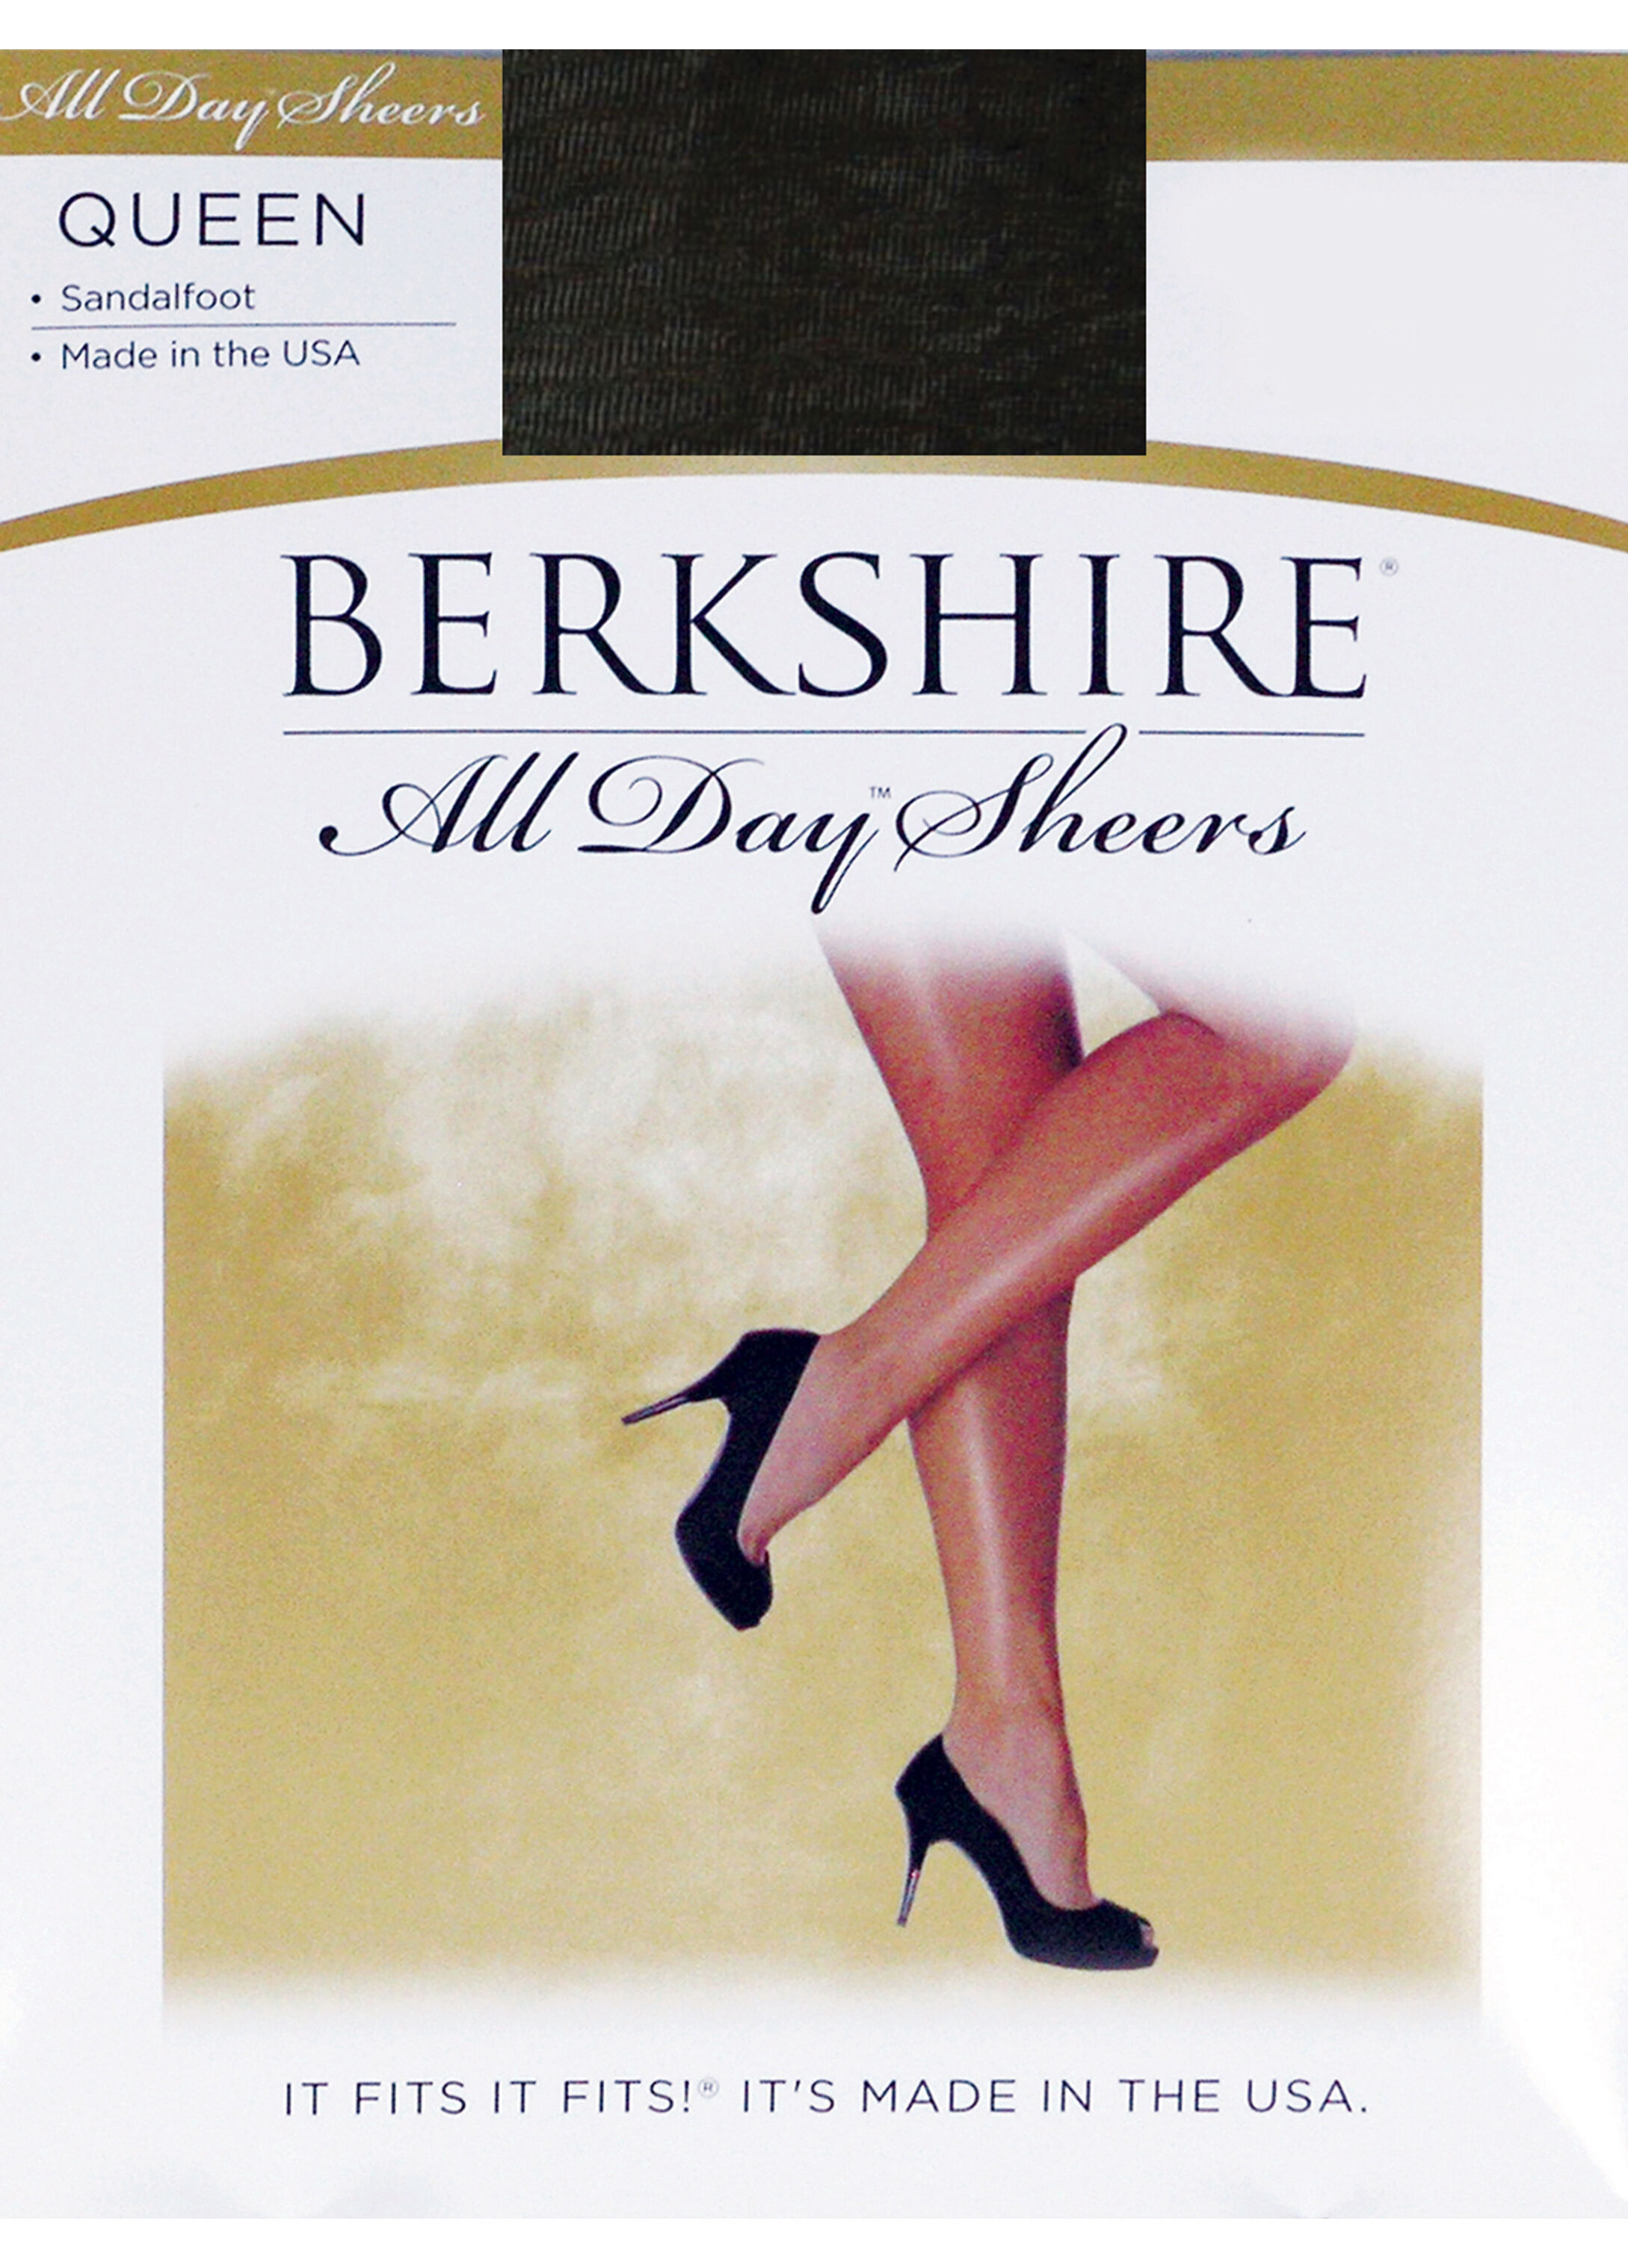 Berkshire All Day Sheer Sandalfoot Pantyhose